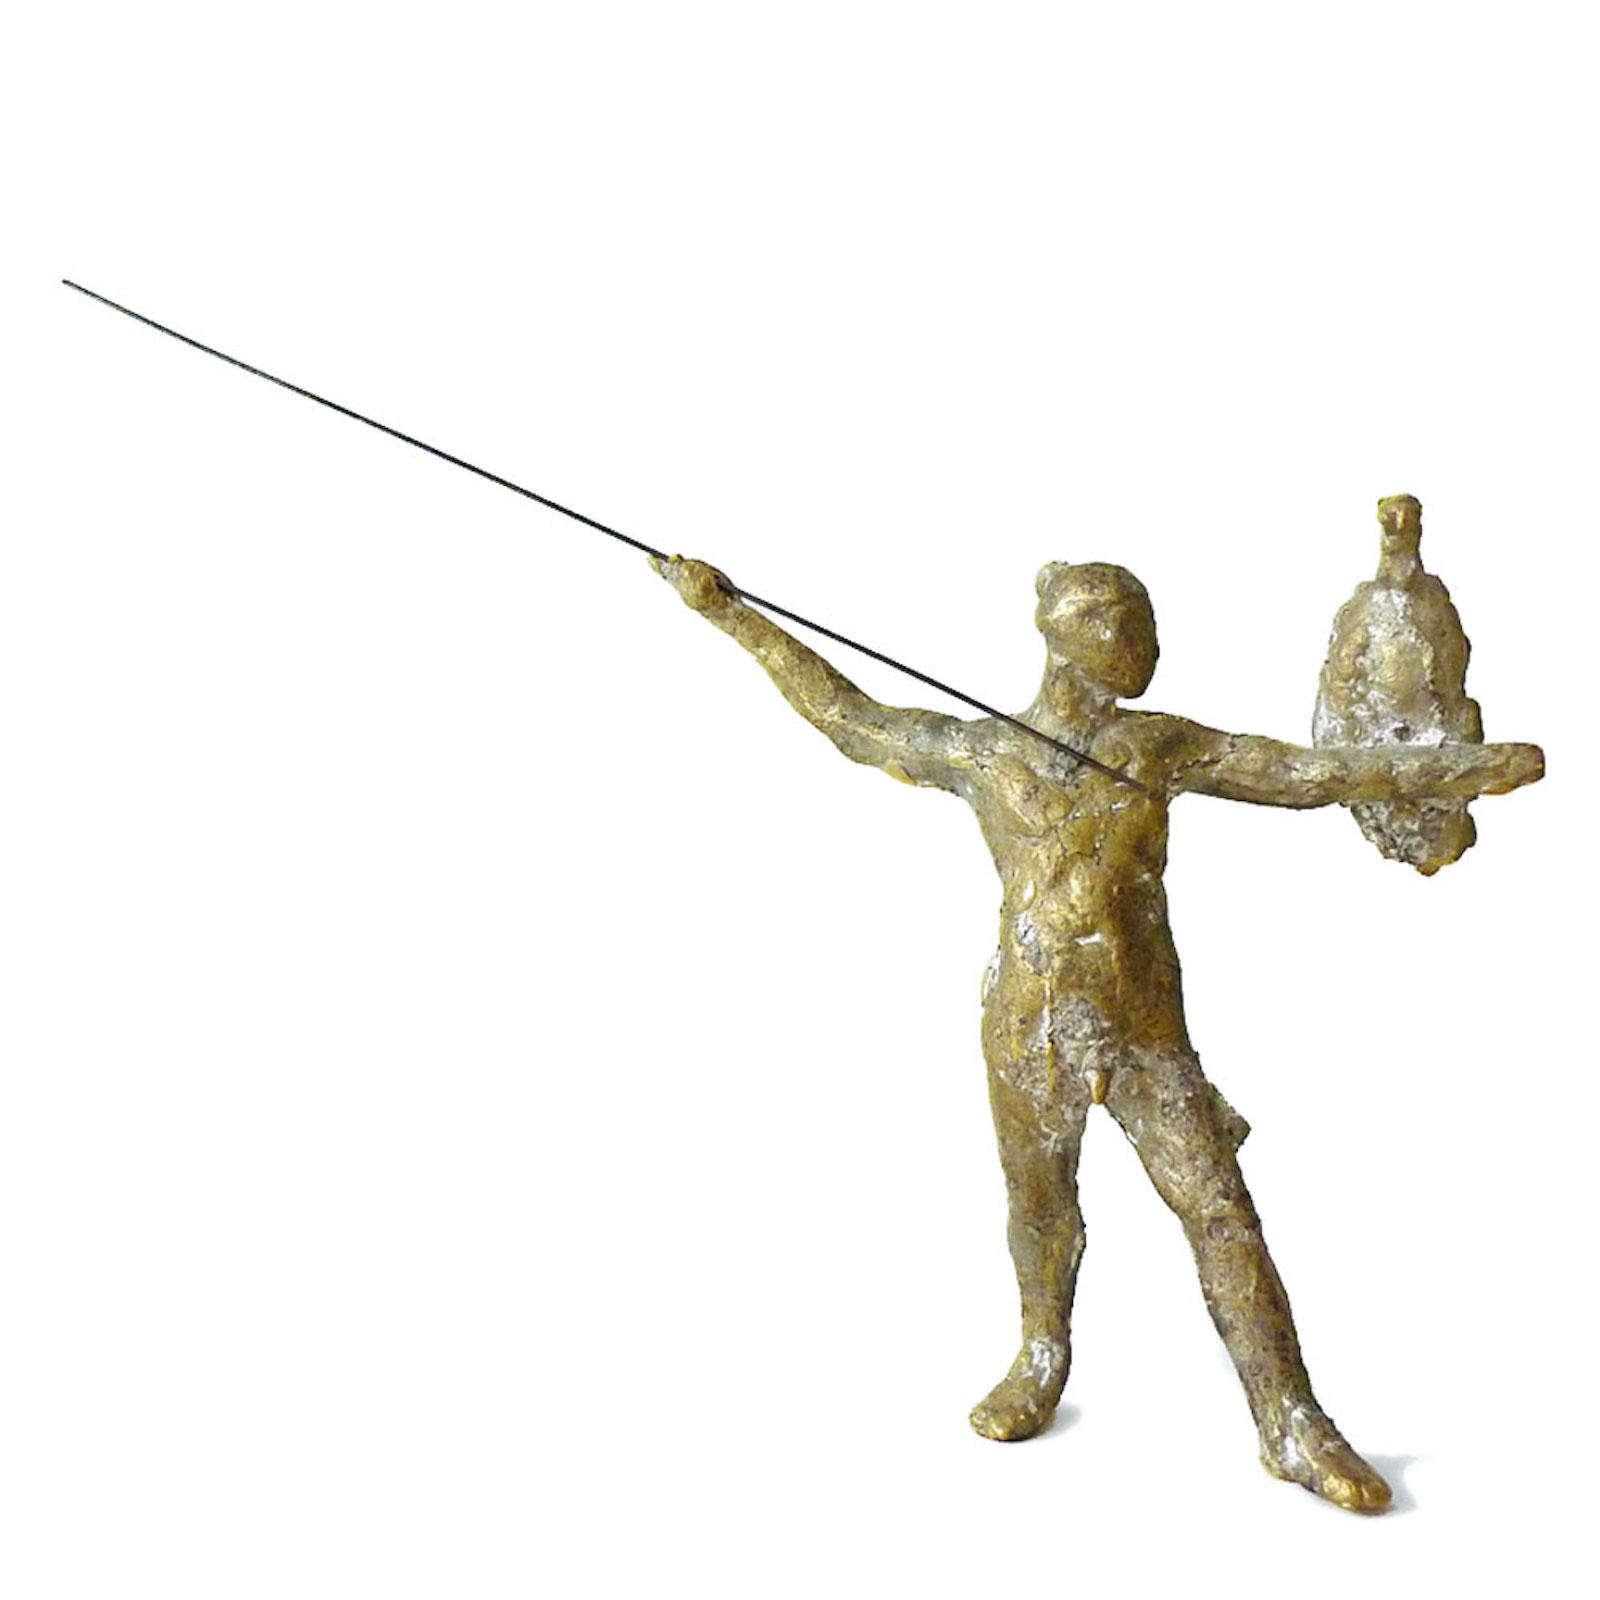 "Fredrik Wretman, ""Hunter"", 2014, bronze"